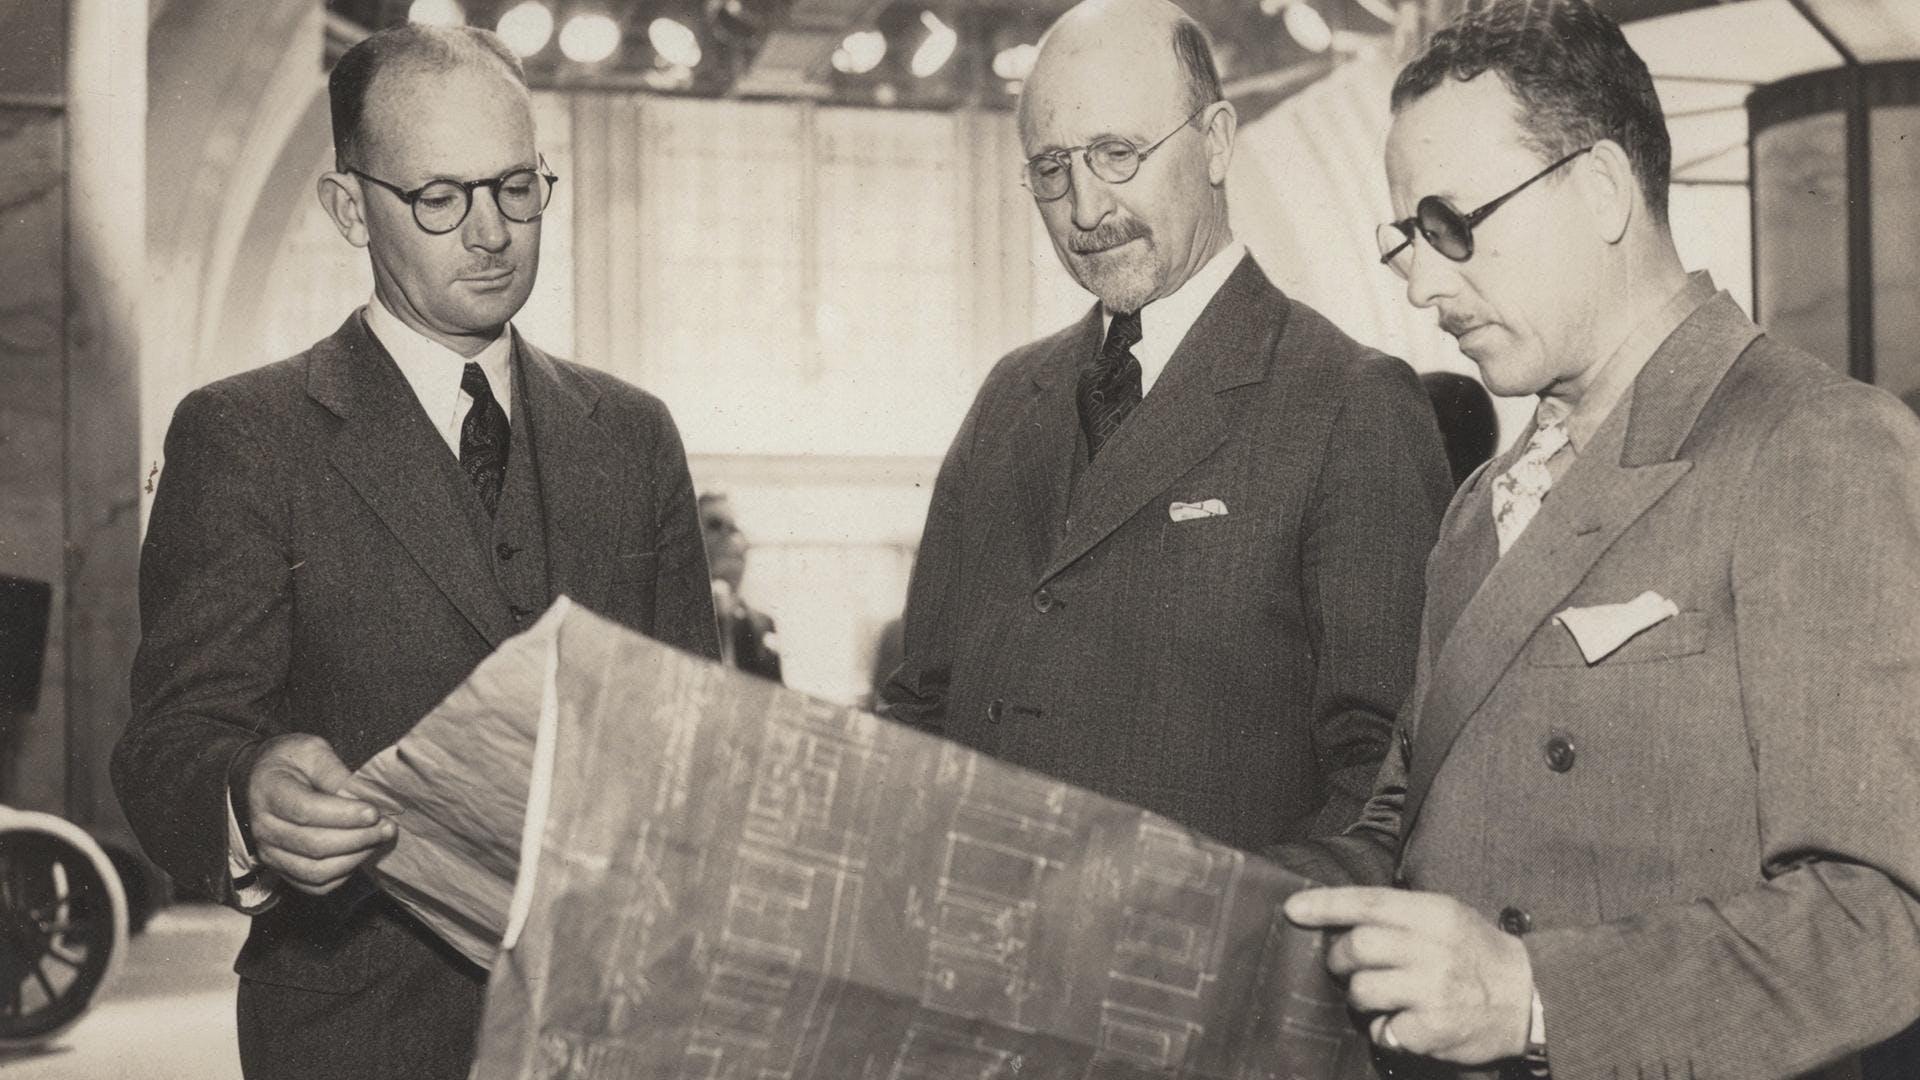 Iconic Vision John Parkinson Architect of Los Angeles Film Screening